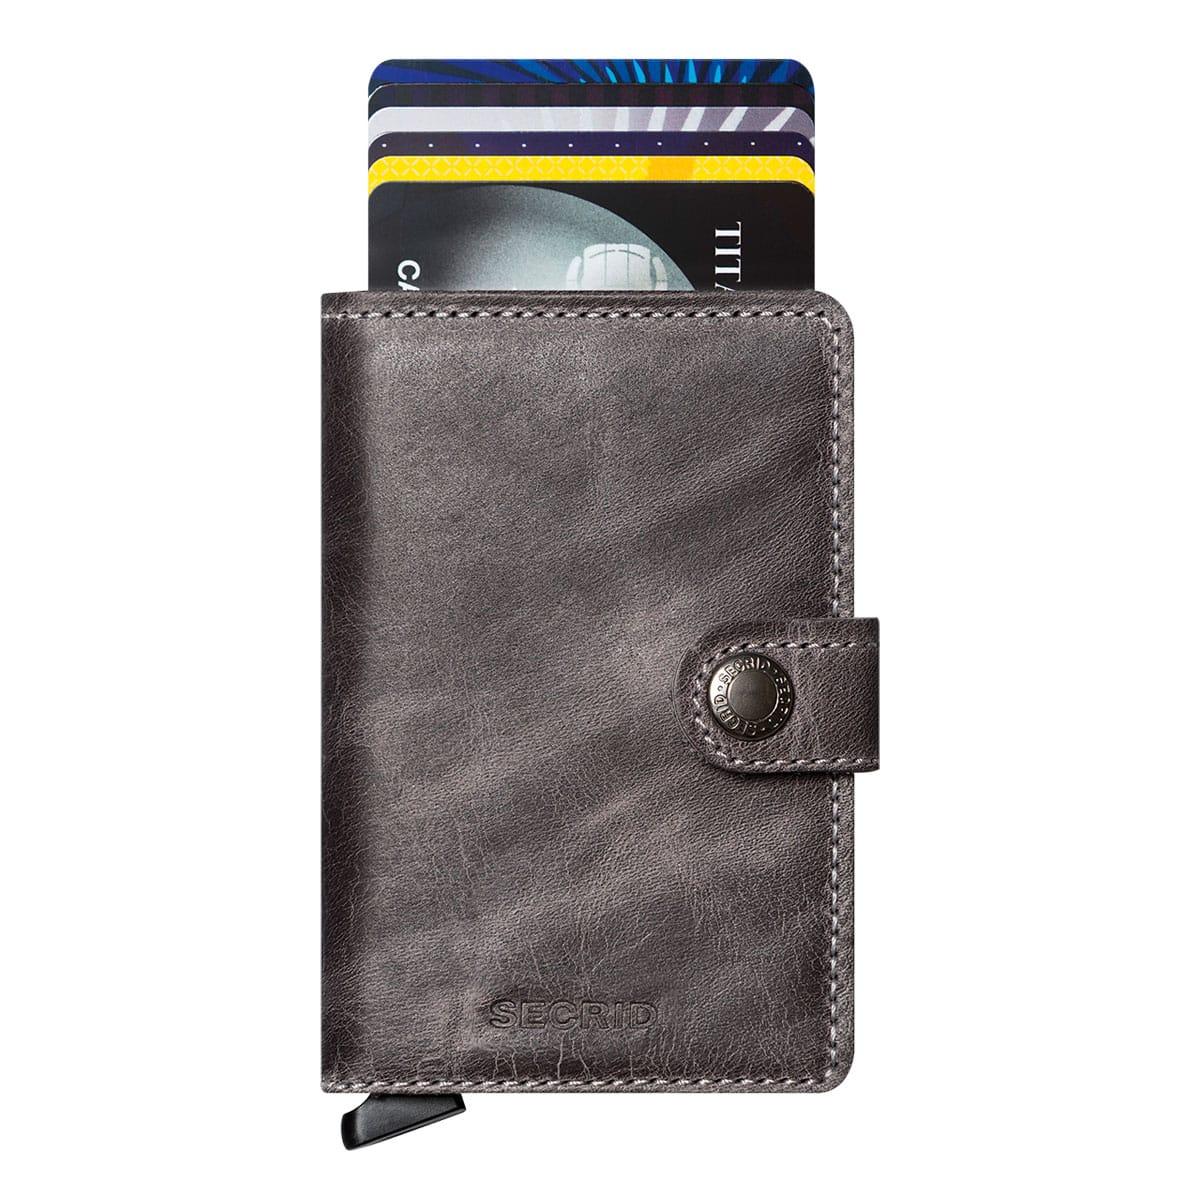 Secrid - Miniwallet Vintage grey